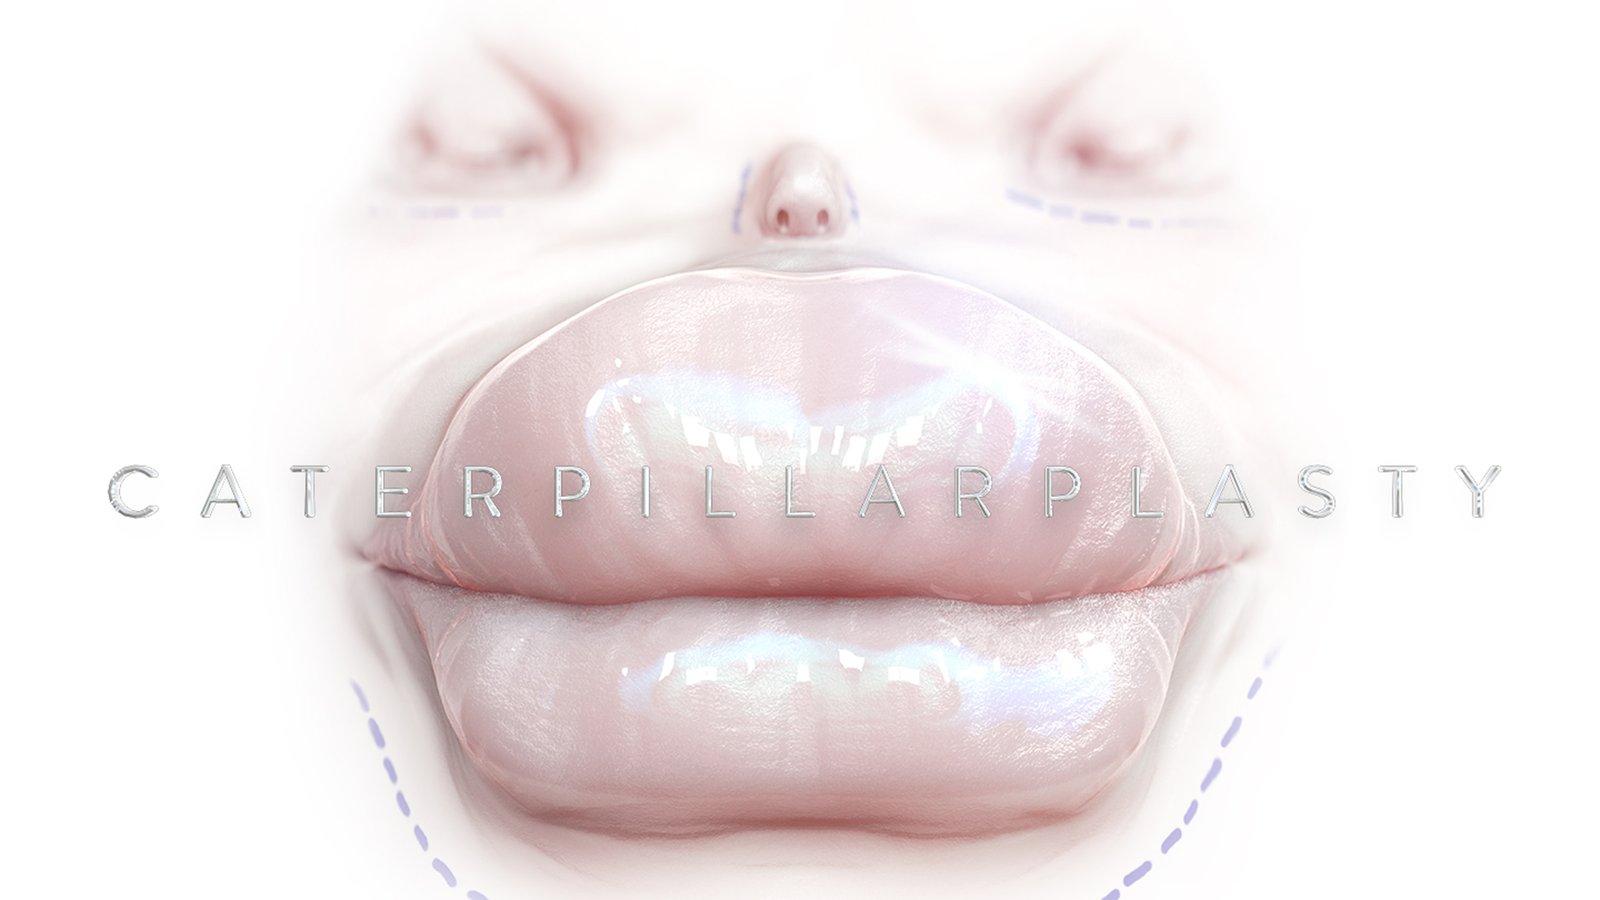 Caterpllarplasty